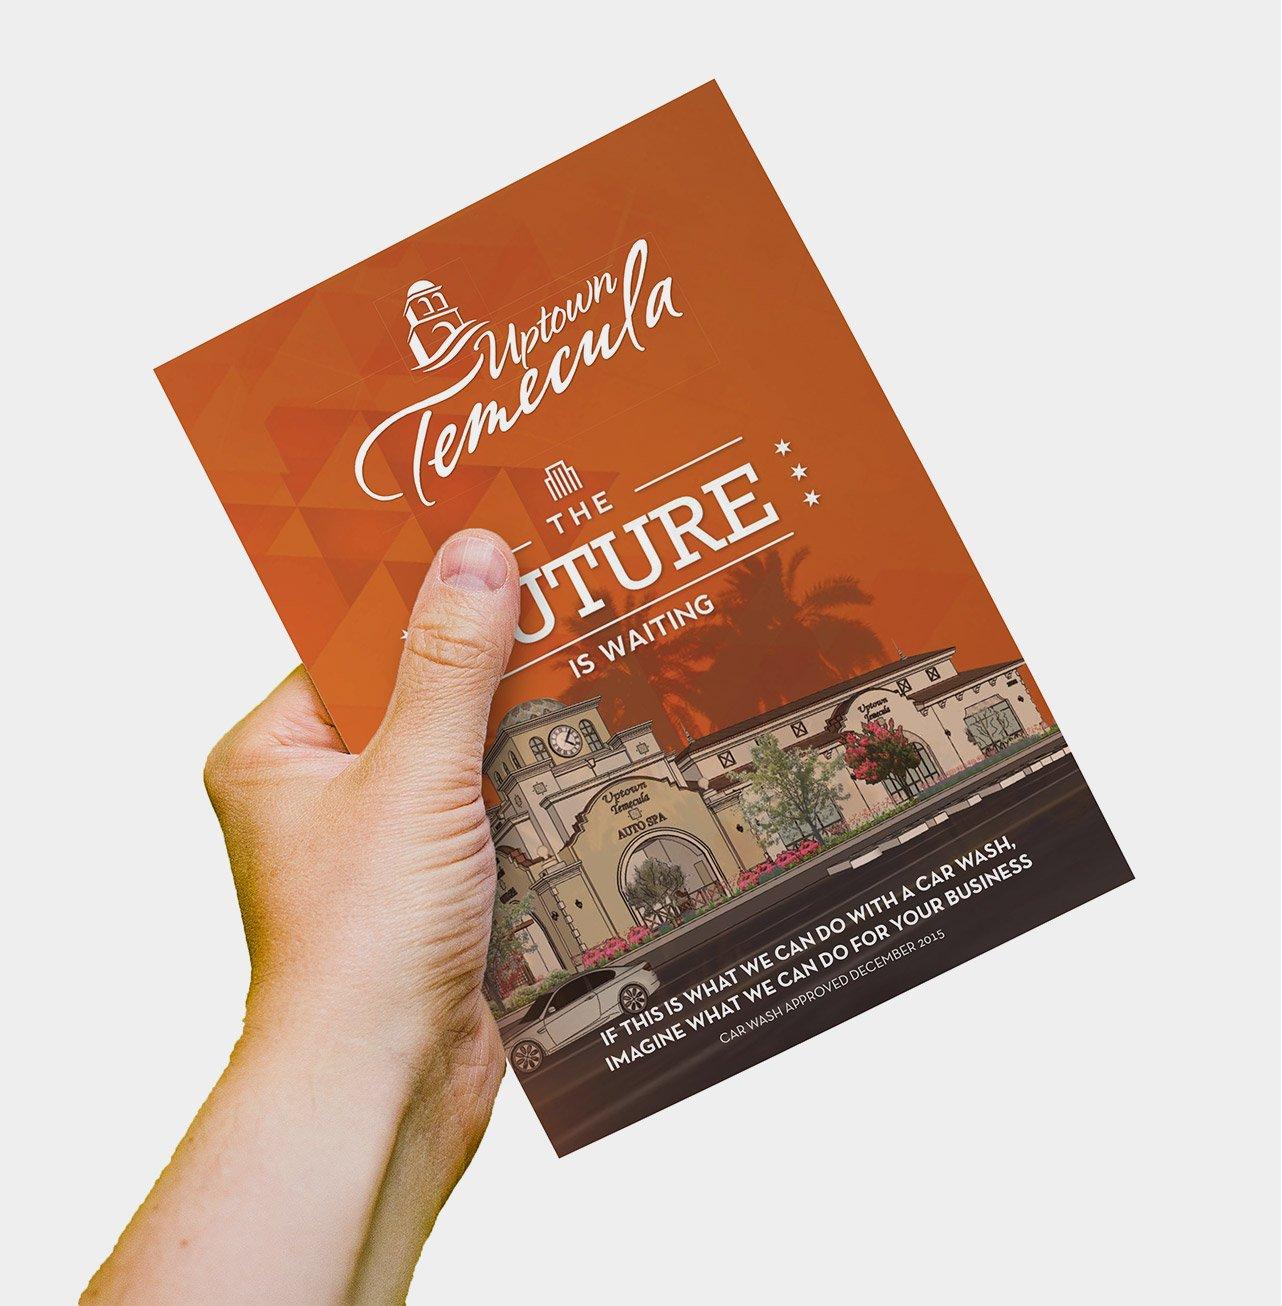 Uptown Temecula booklet